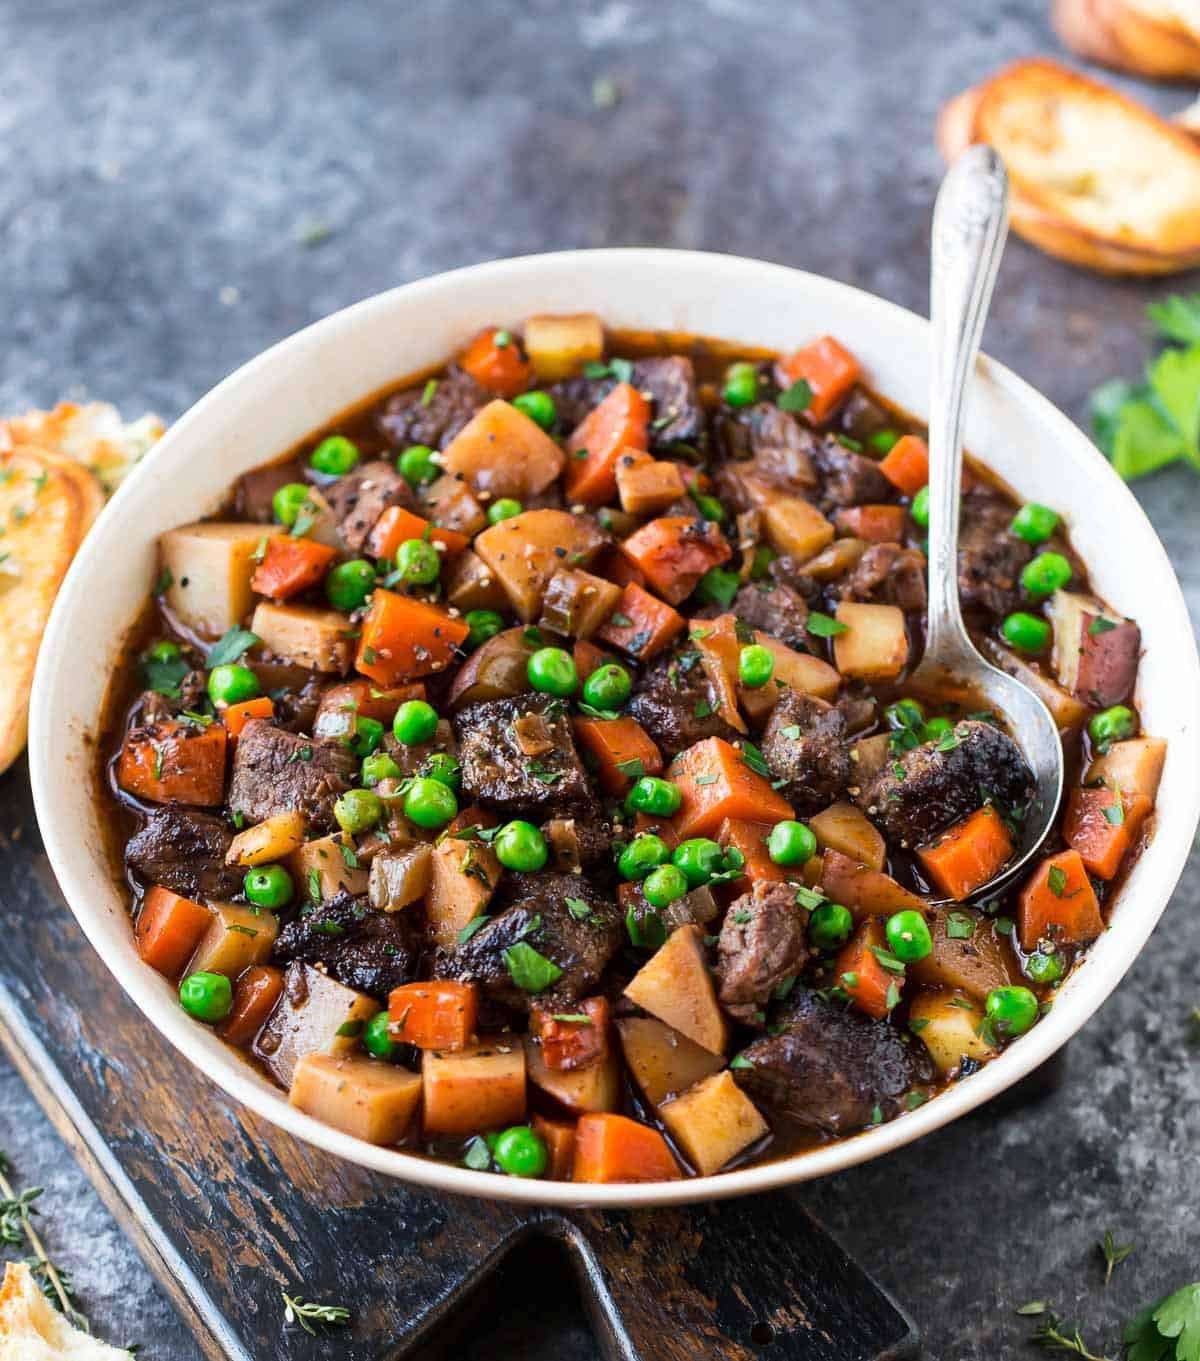 Best Meat For Beef Stew  Crock Pot Beef Stew Recipe